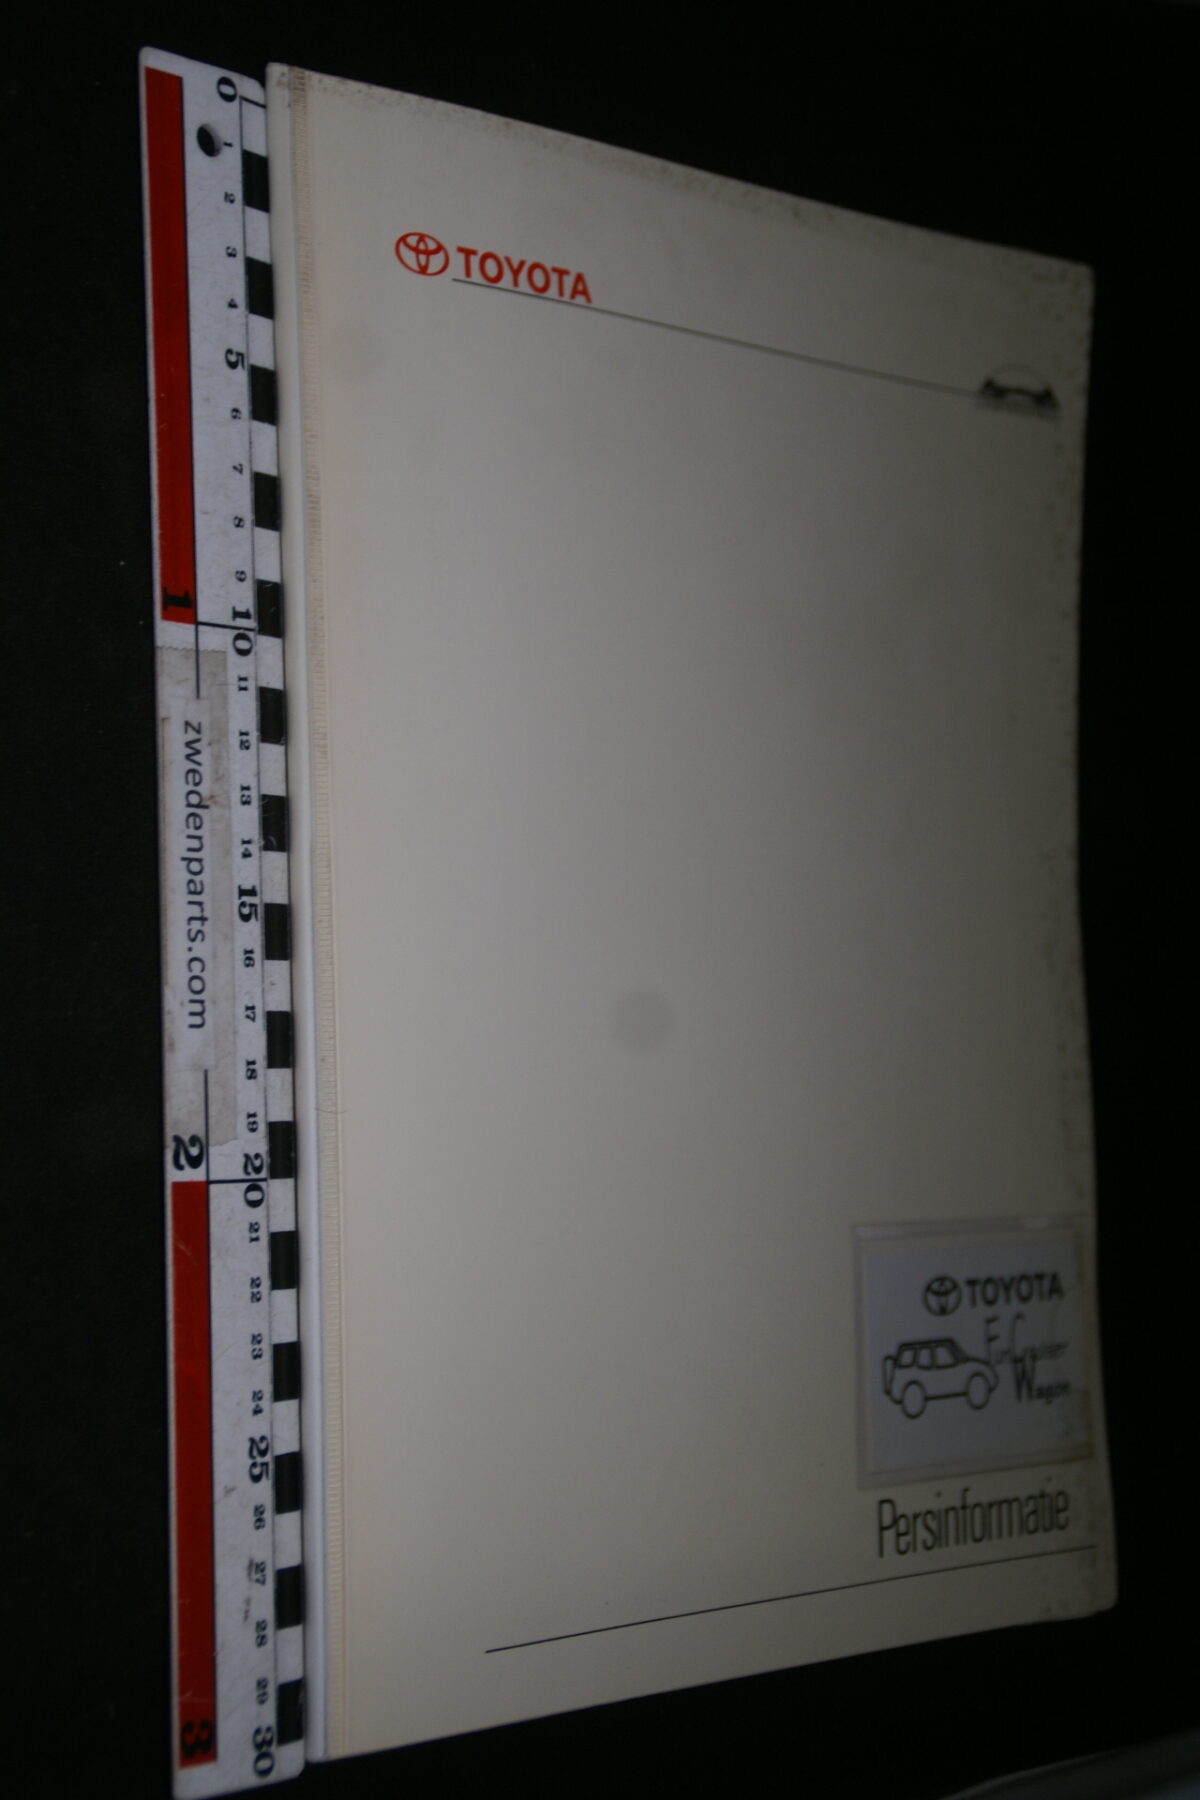 DSC05317 1995 originele RAI persmap Toyota Wagon-6701fbcc